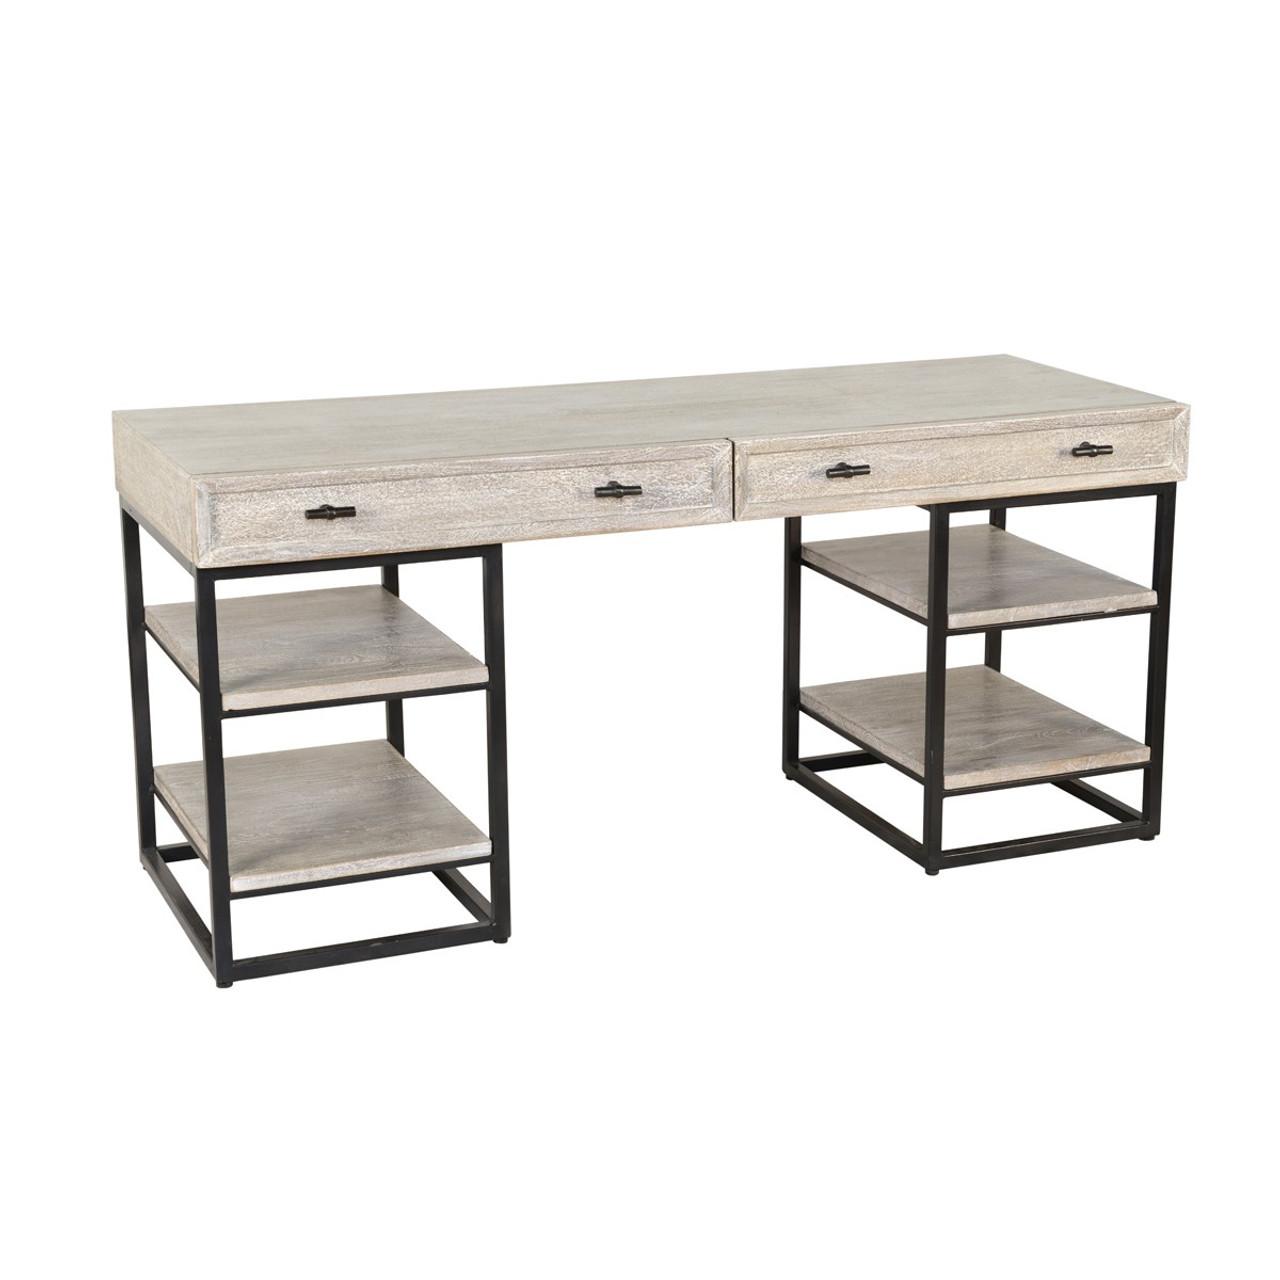 Marvelous Marabella Solid Wood Whitewash 2 Drawer Desk Download Free Architecture Designs Scobabritishbridgeorg